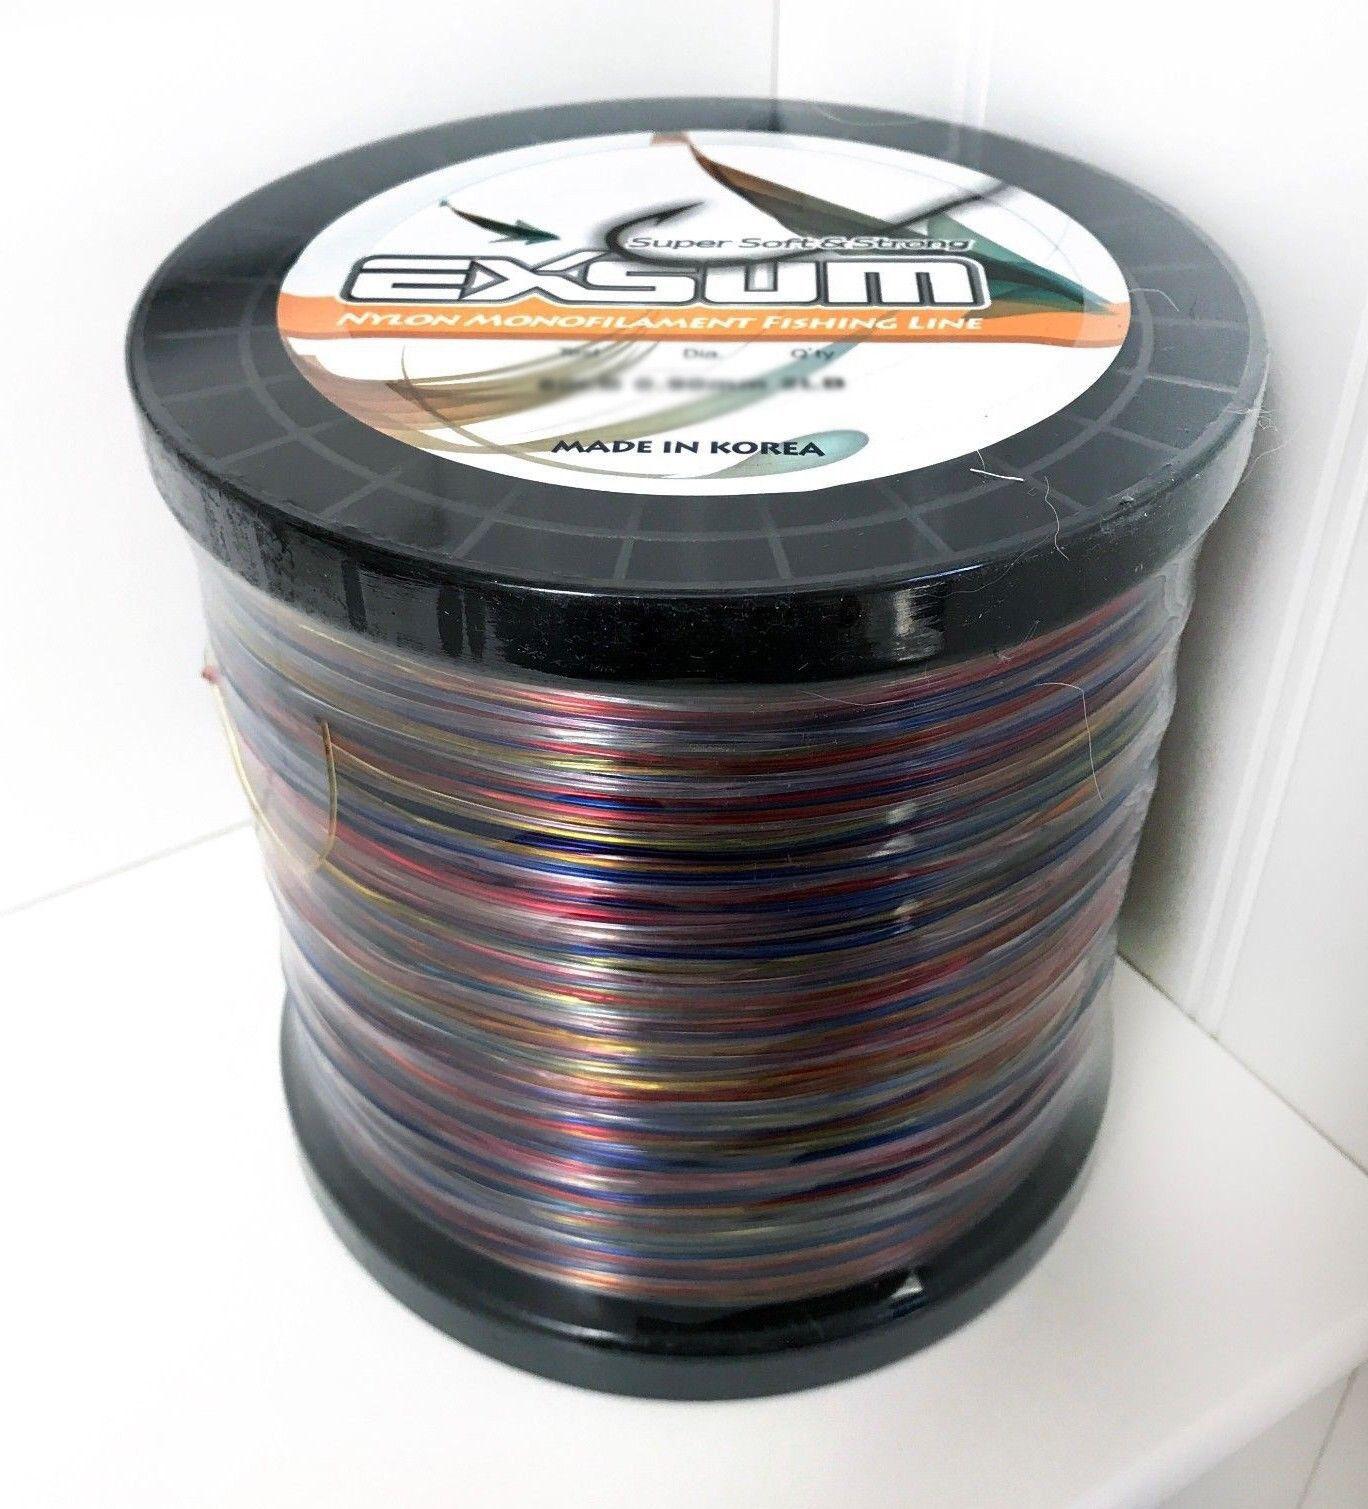 EXSUM Nylon Monofilament Fishing Line Super Soft Strong 150LB 5LB - Rainbow Camo